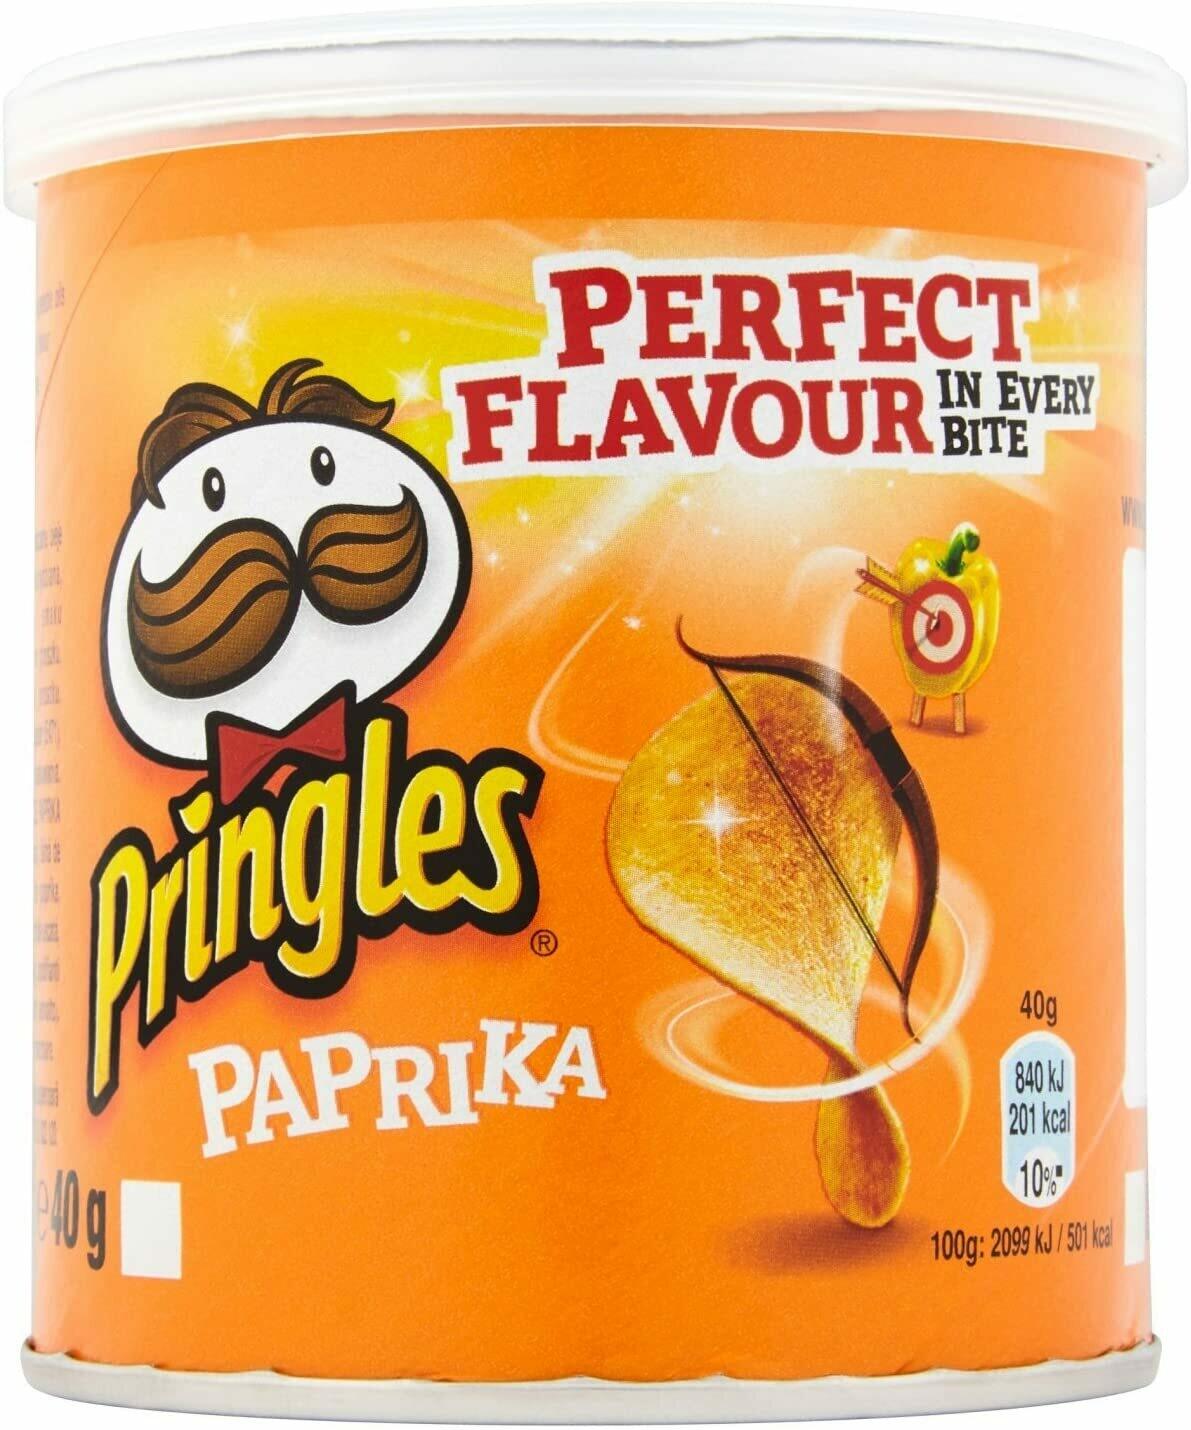 Pringles Paprika Potato Chips 40 g (Pack of 12)